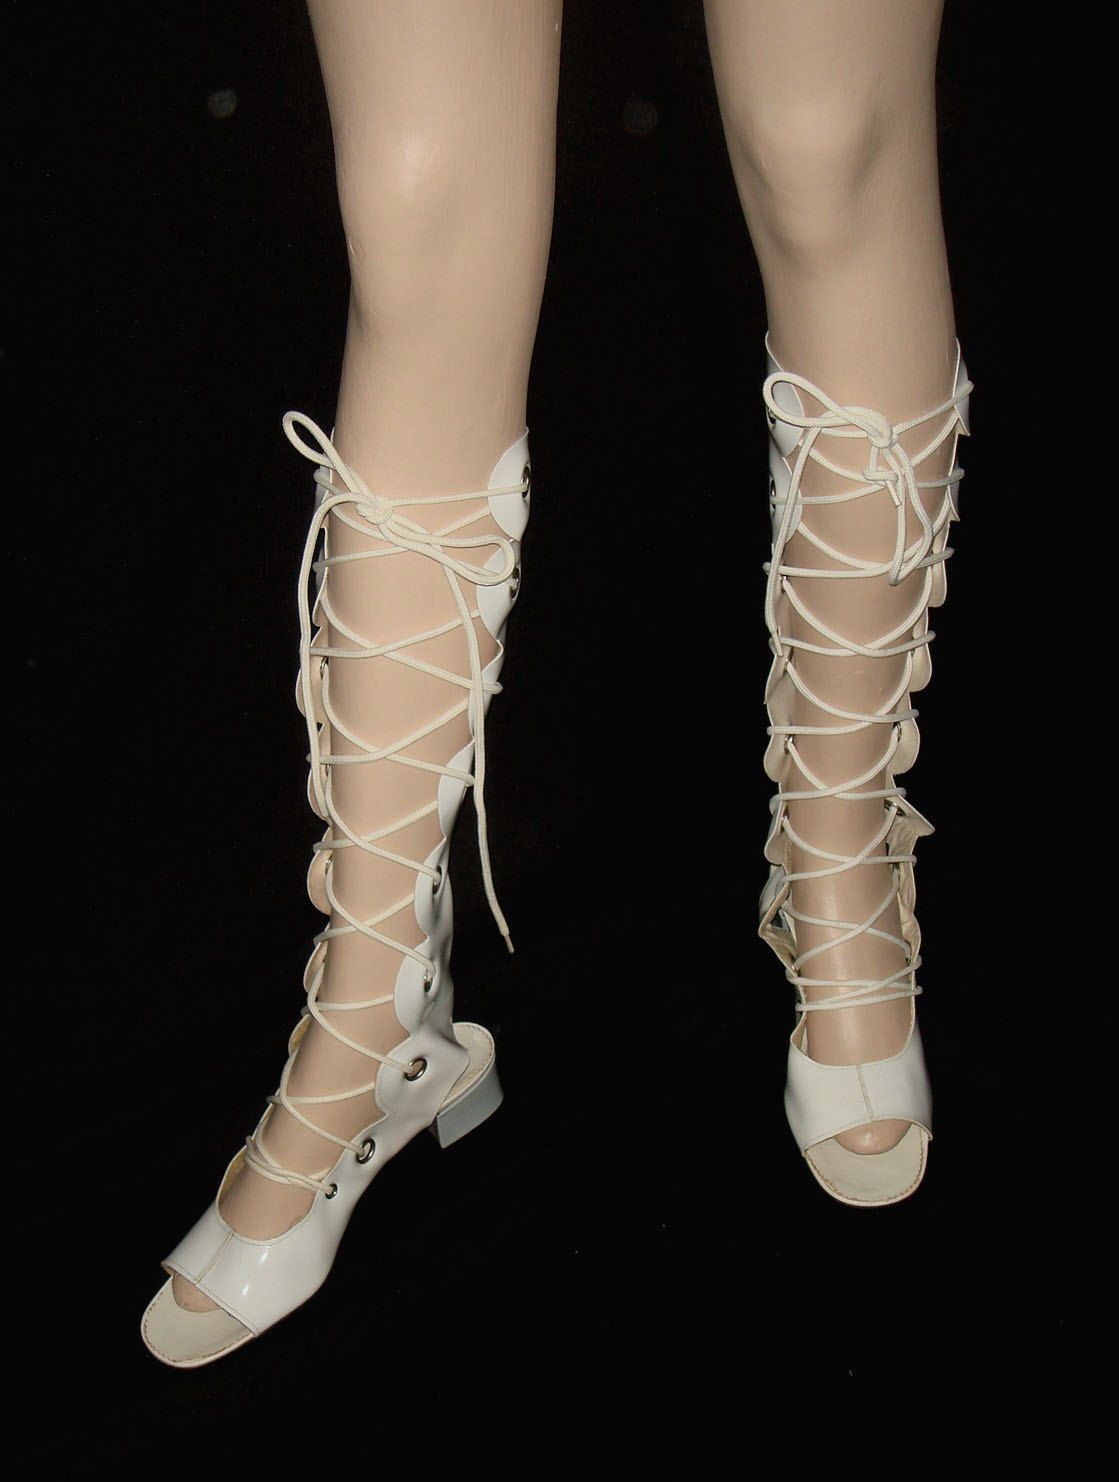 2ad72de306e Vintage 60s Gladiator Lace Up Open Toe Vinyl Boots    1960s Mod White Vinyl  Go-Go Gladiator Sandal Boots with Grommets